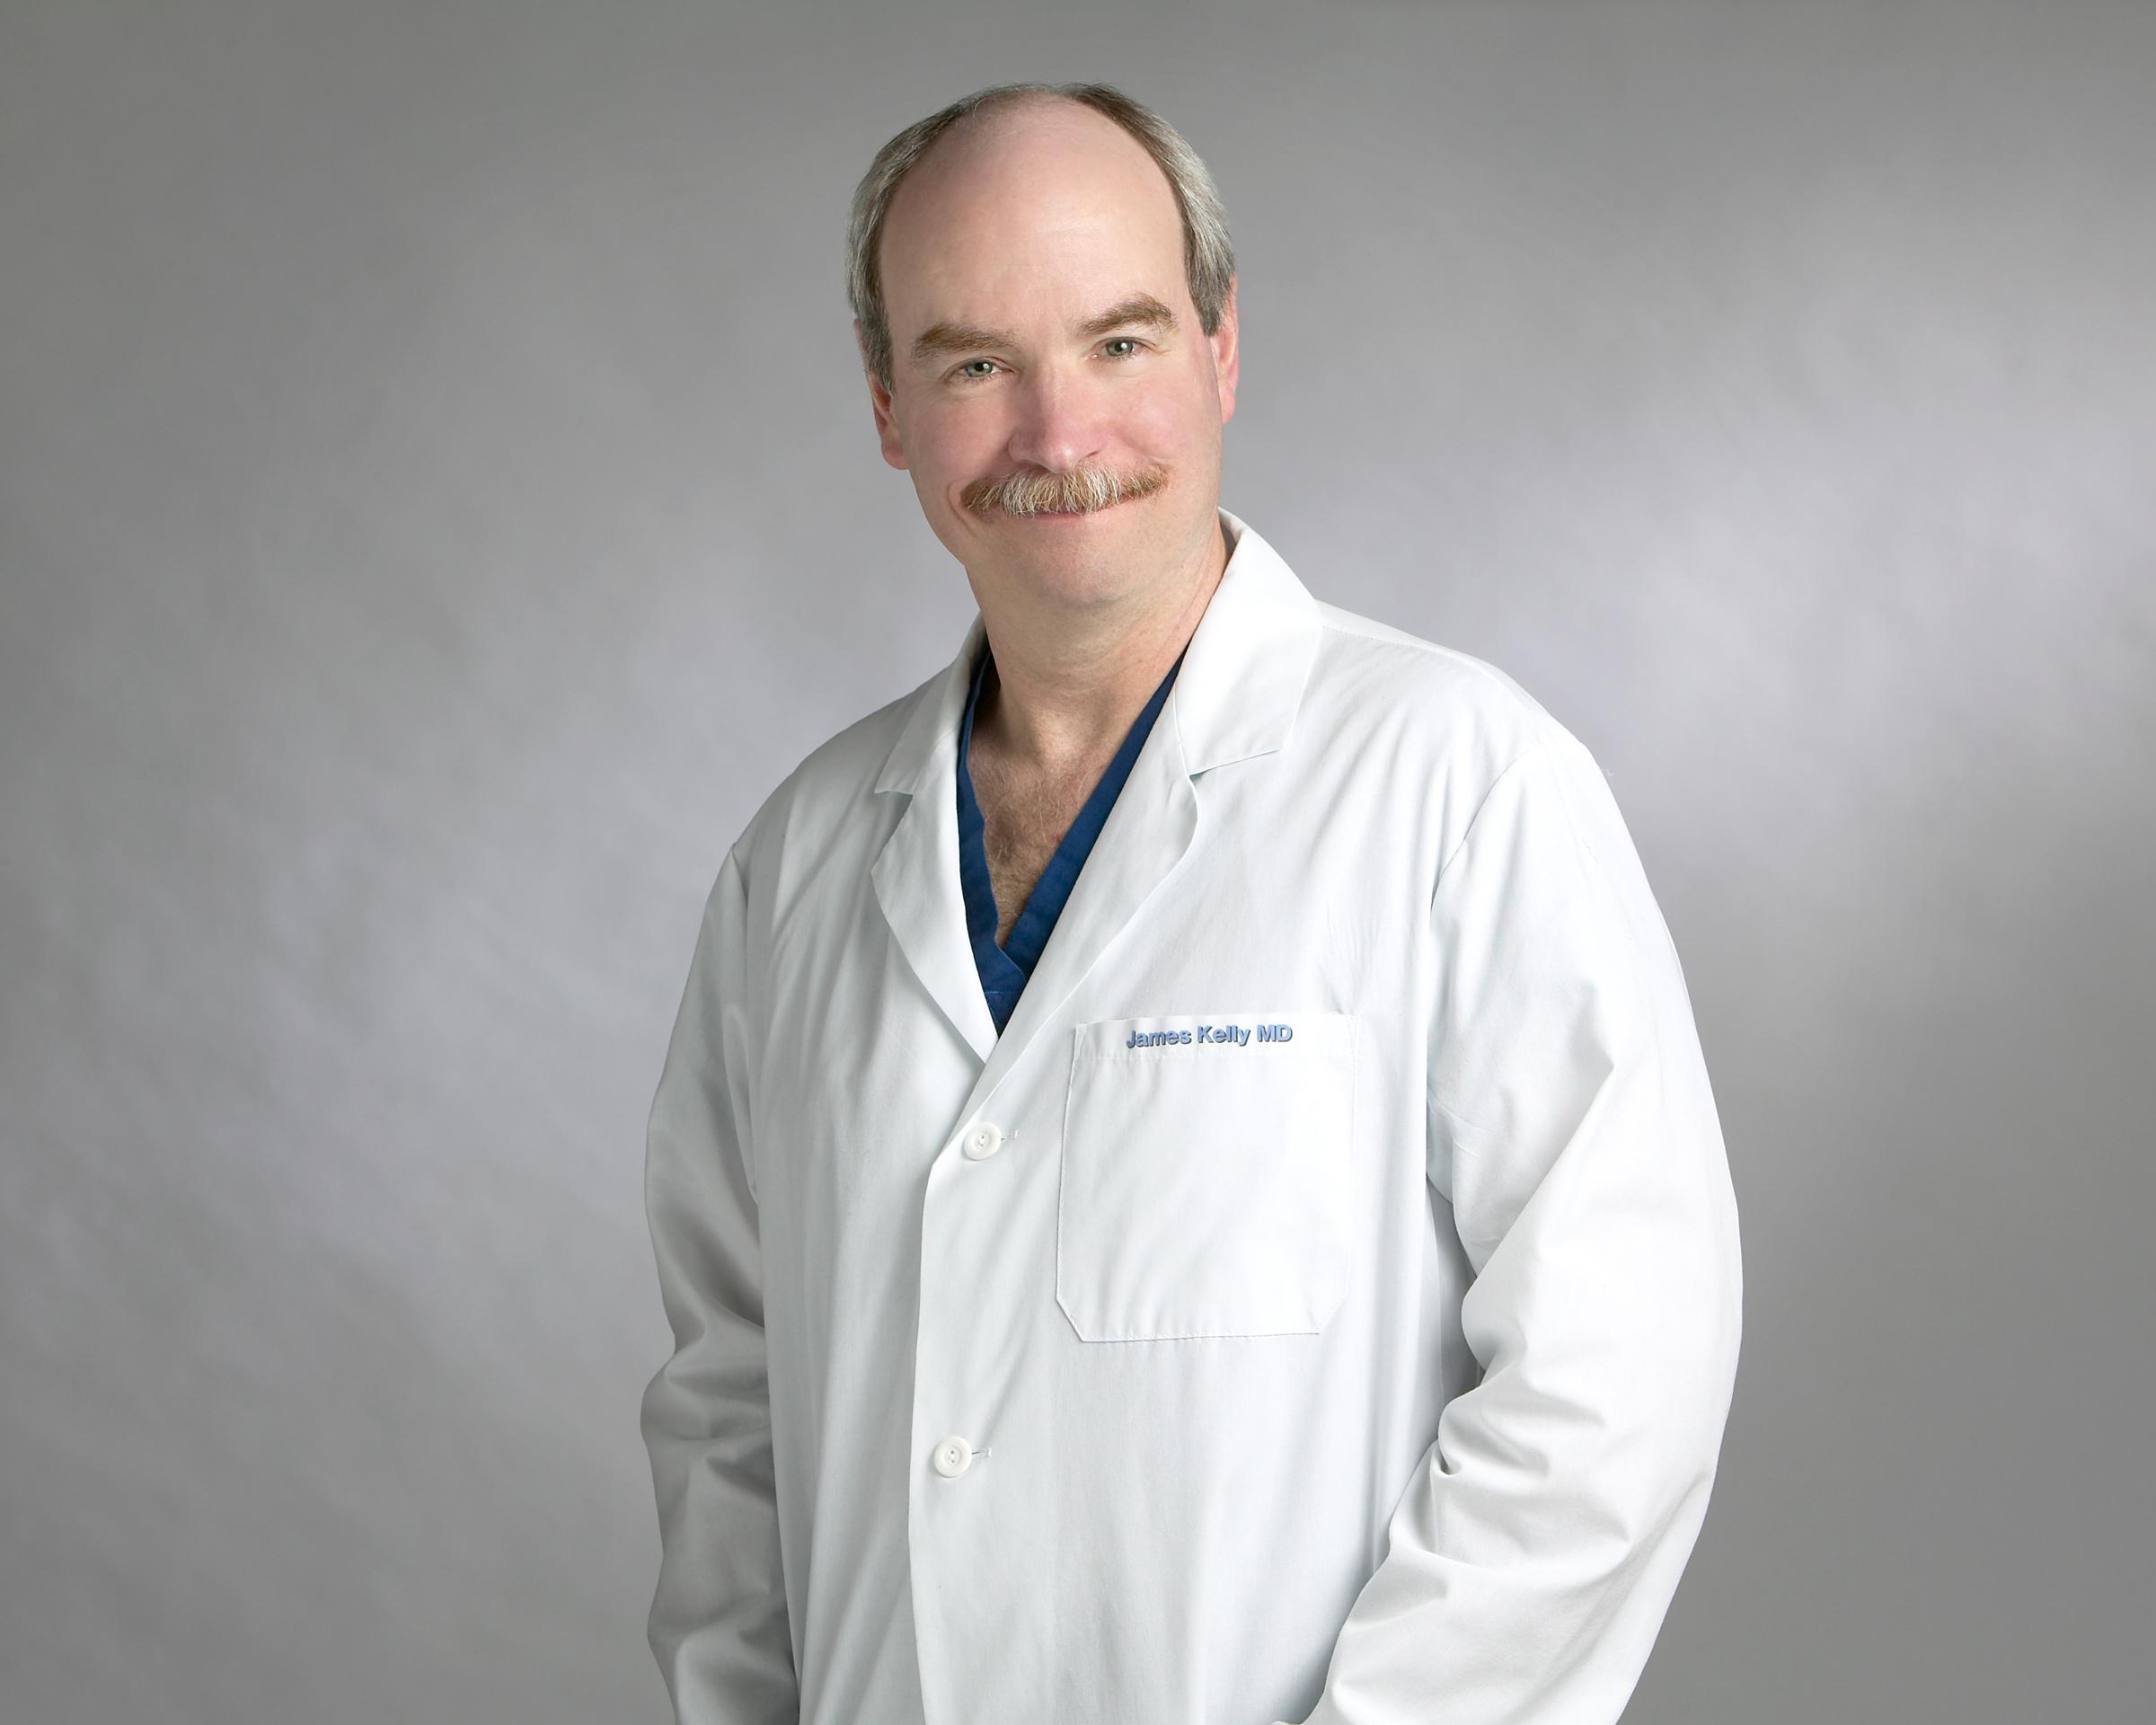 Community Pain Consultants - Dr. James M Kelly image 3